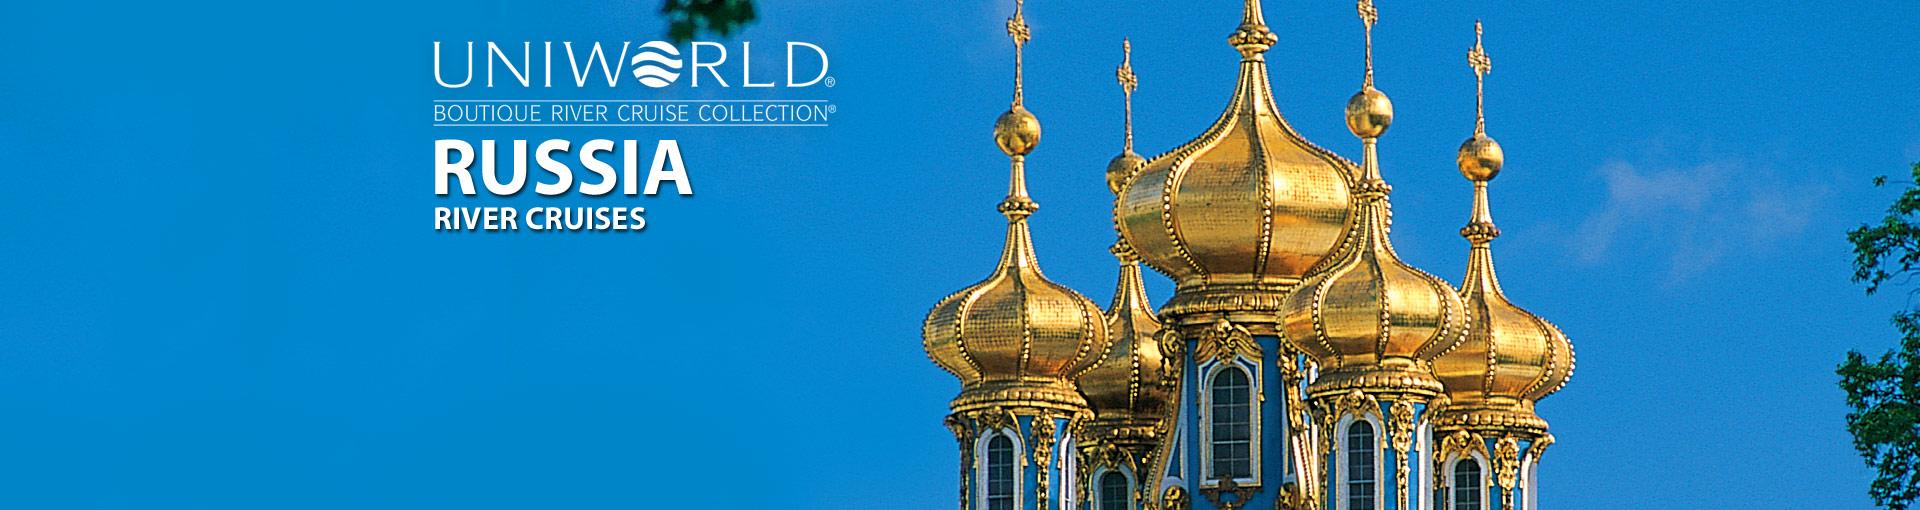 Uniworld River Cruises Russia Cruises